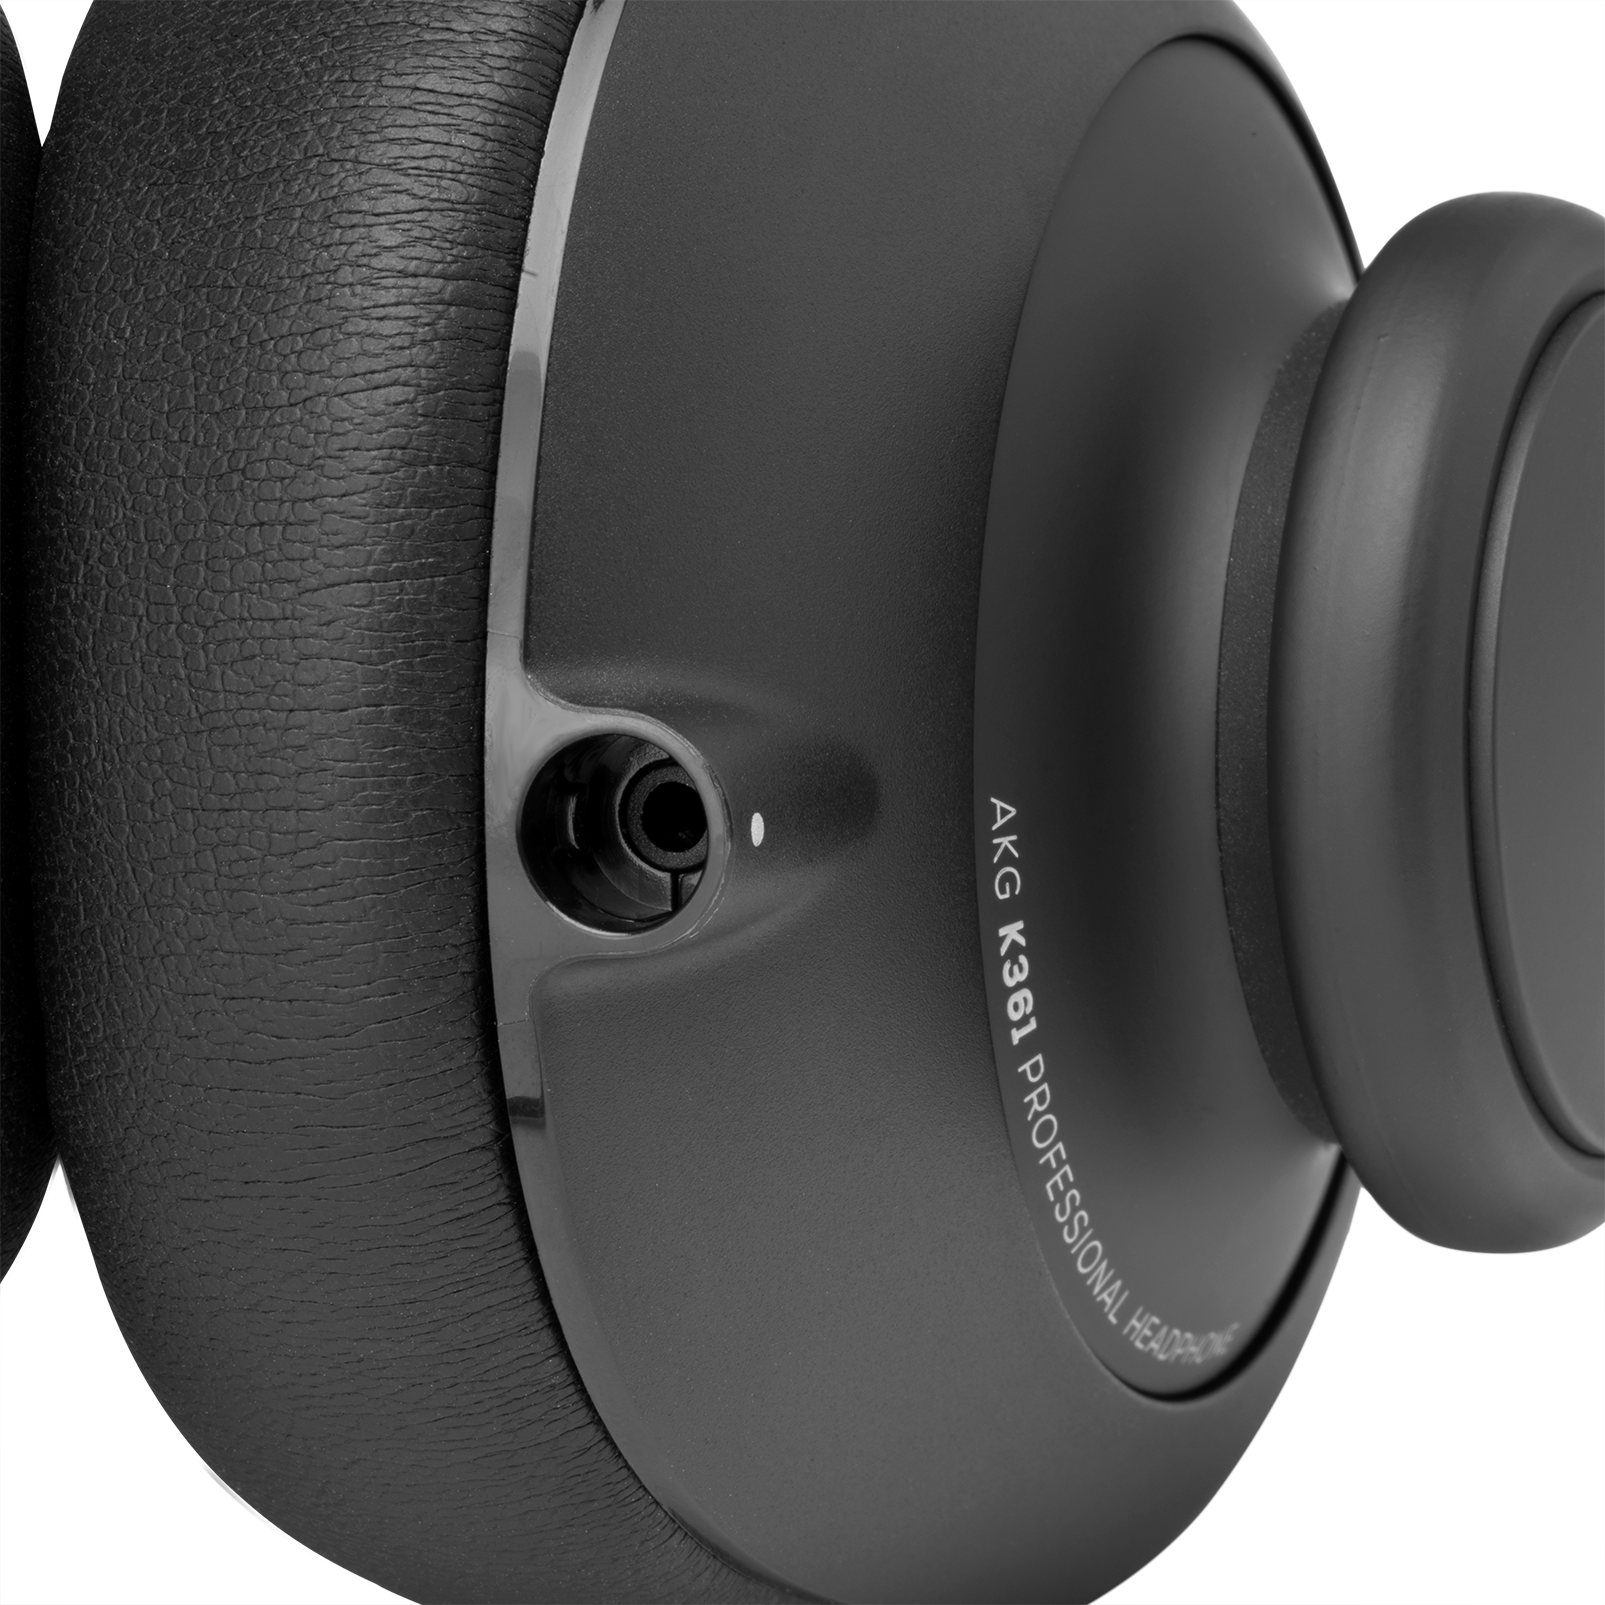 K361 - Black - Over-ear, closed-back, foldable studio headphones - Detailshot 4